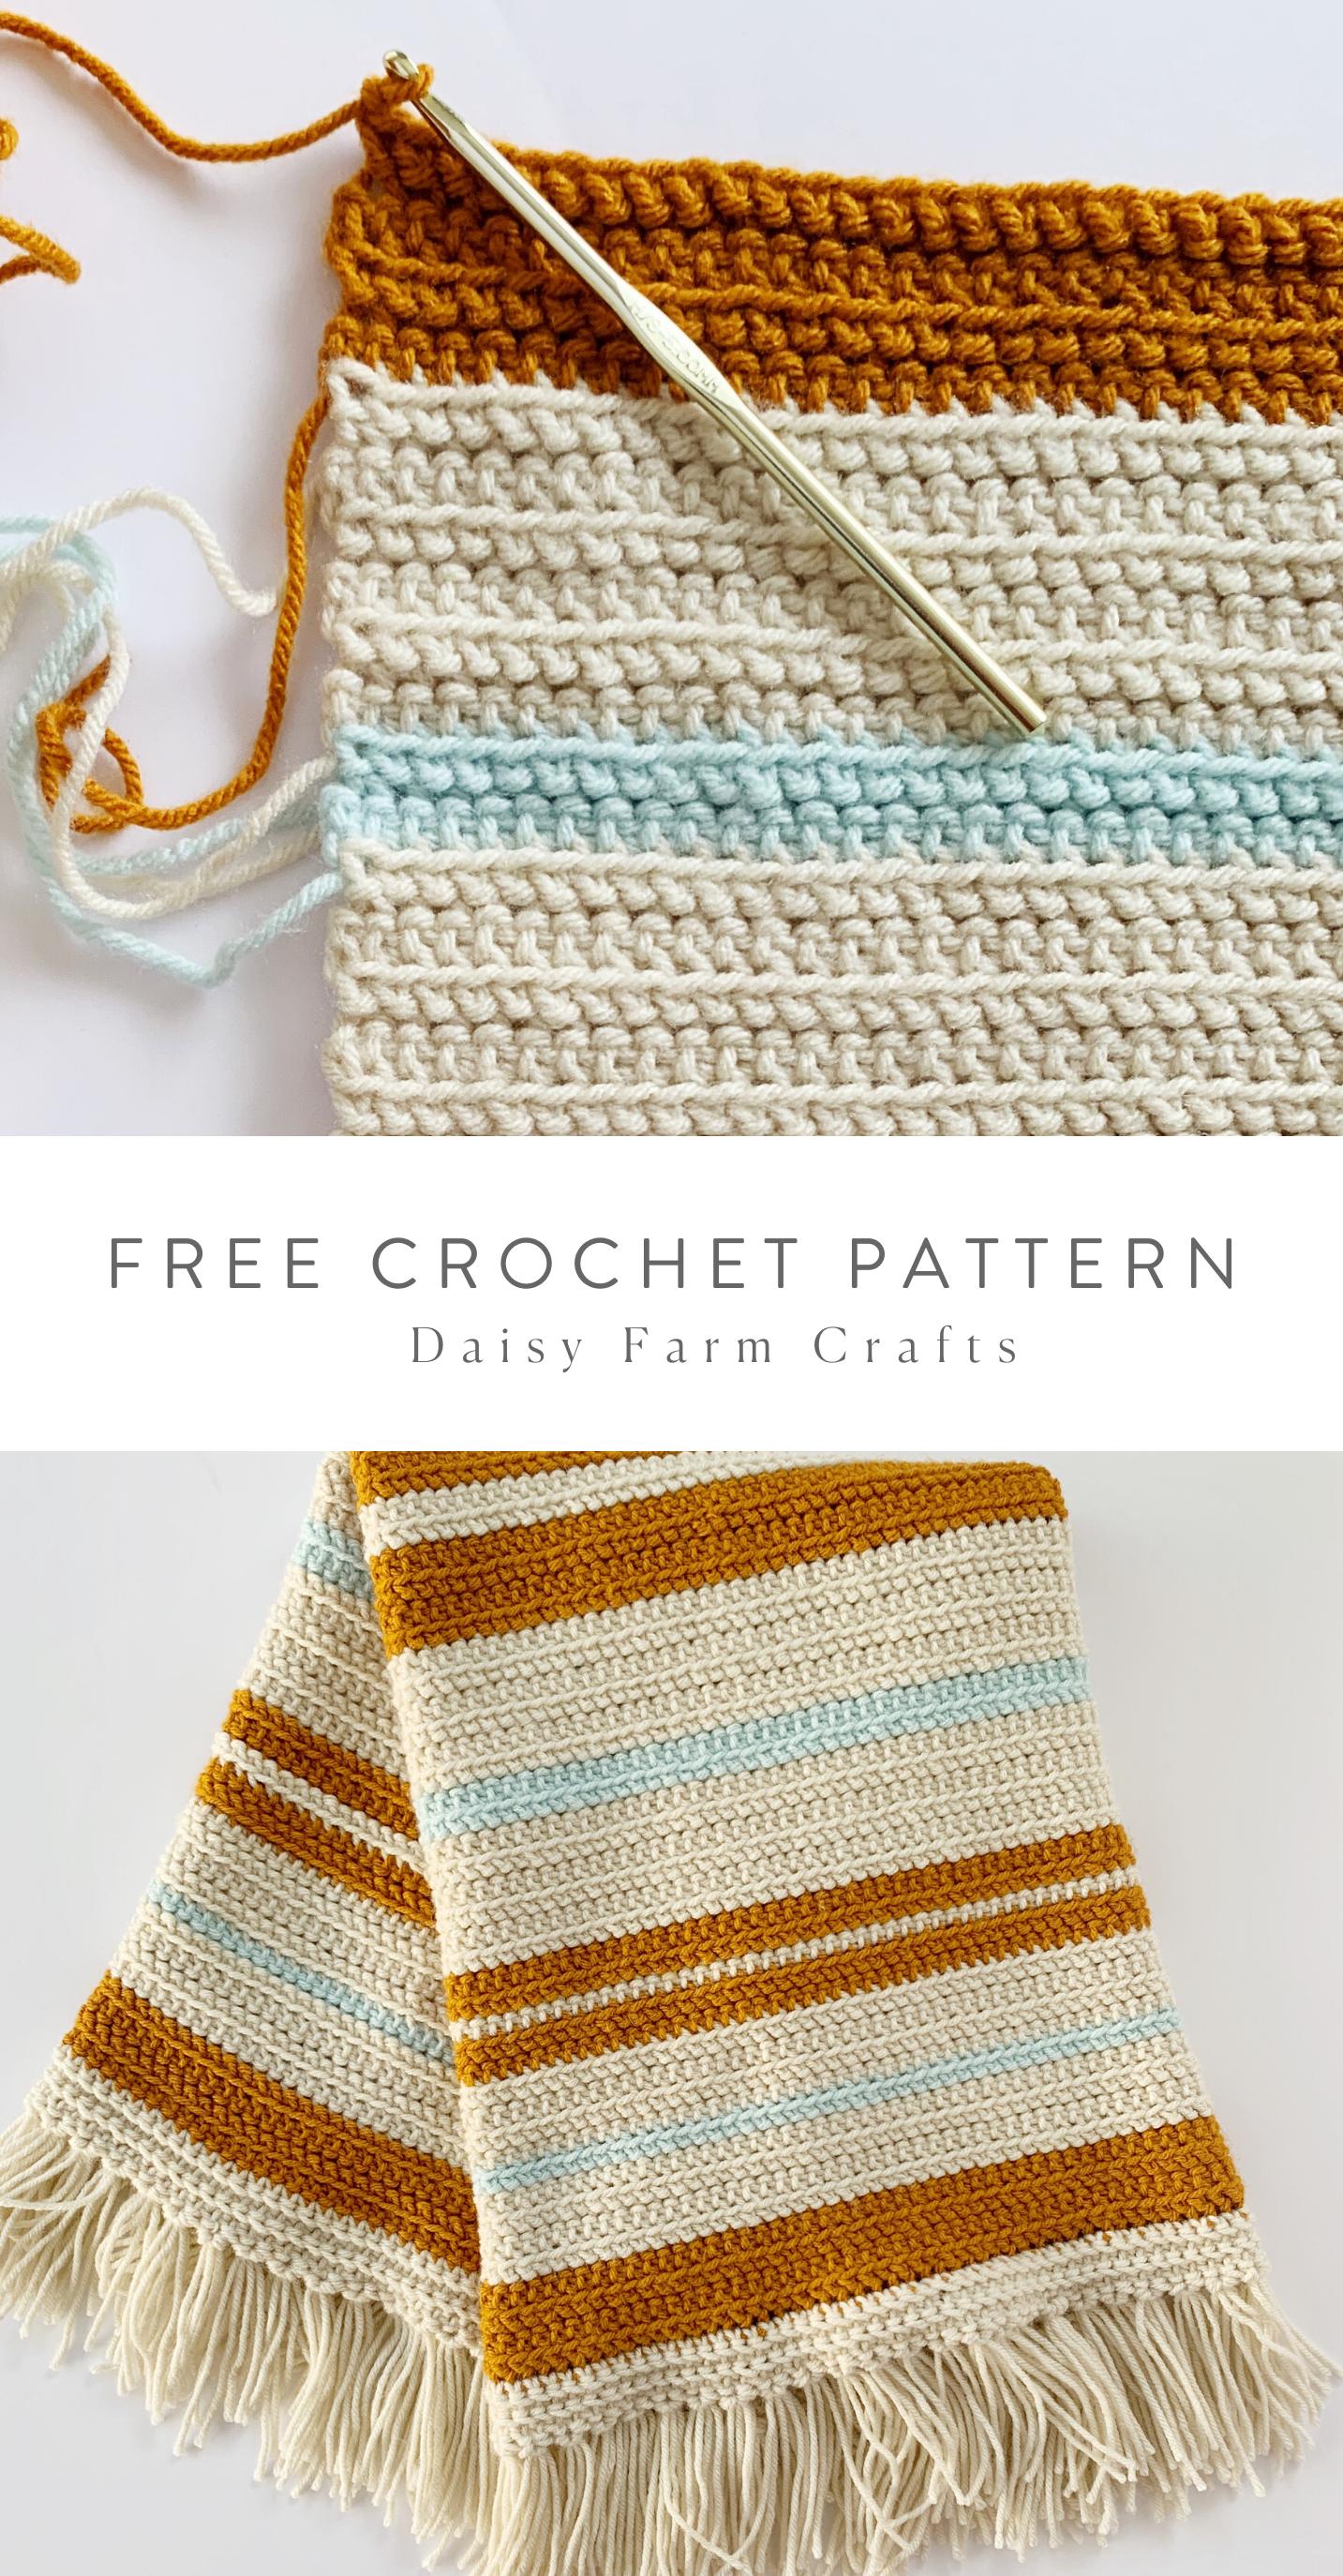 Free Pattern - Crochet Vintage Fringe Stripes Blan